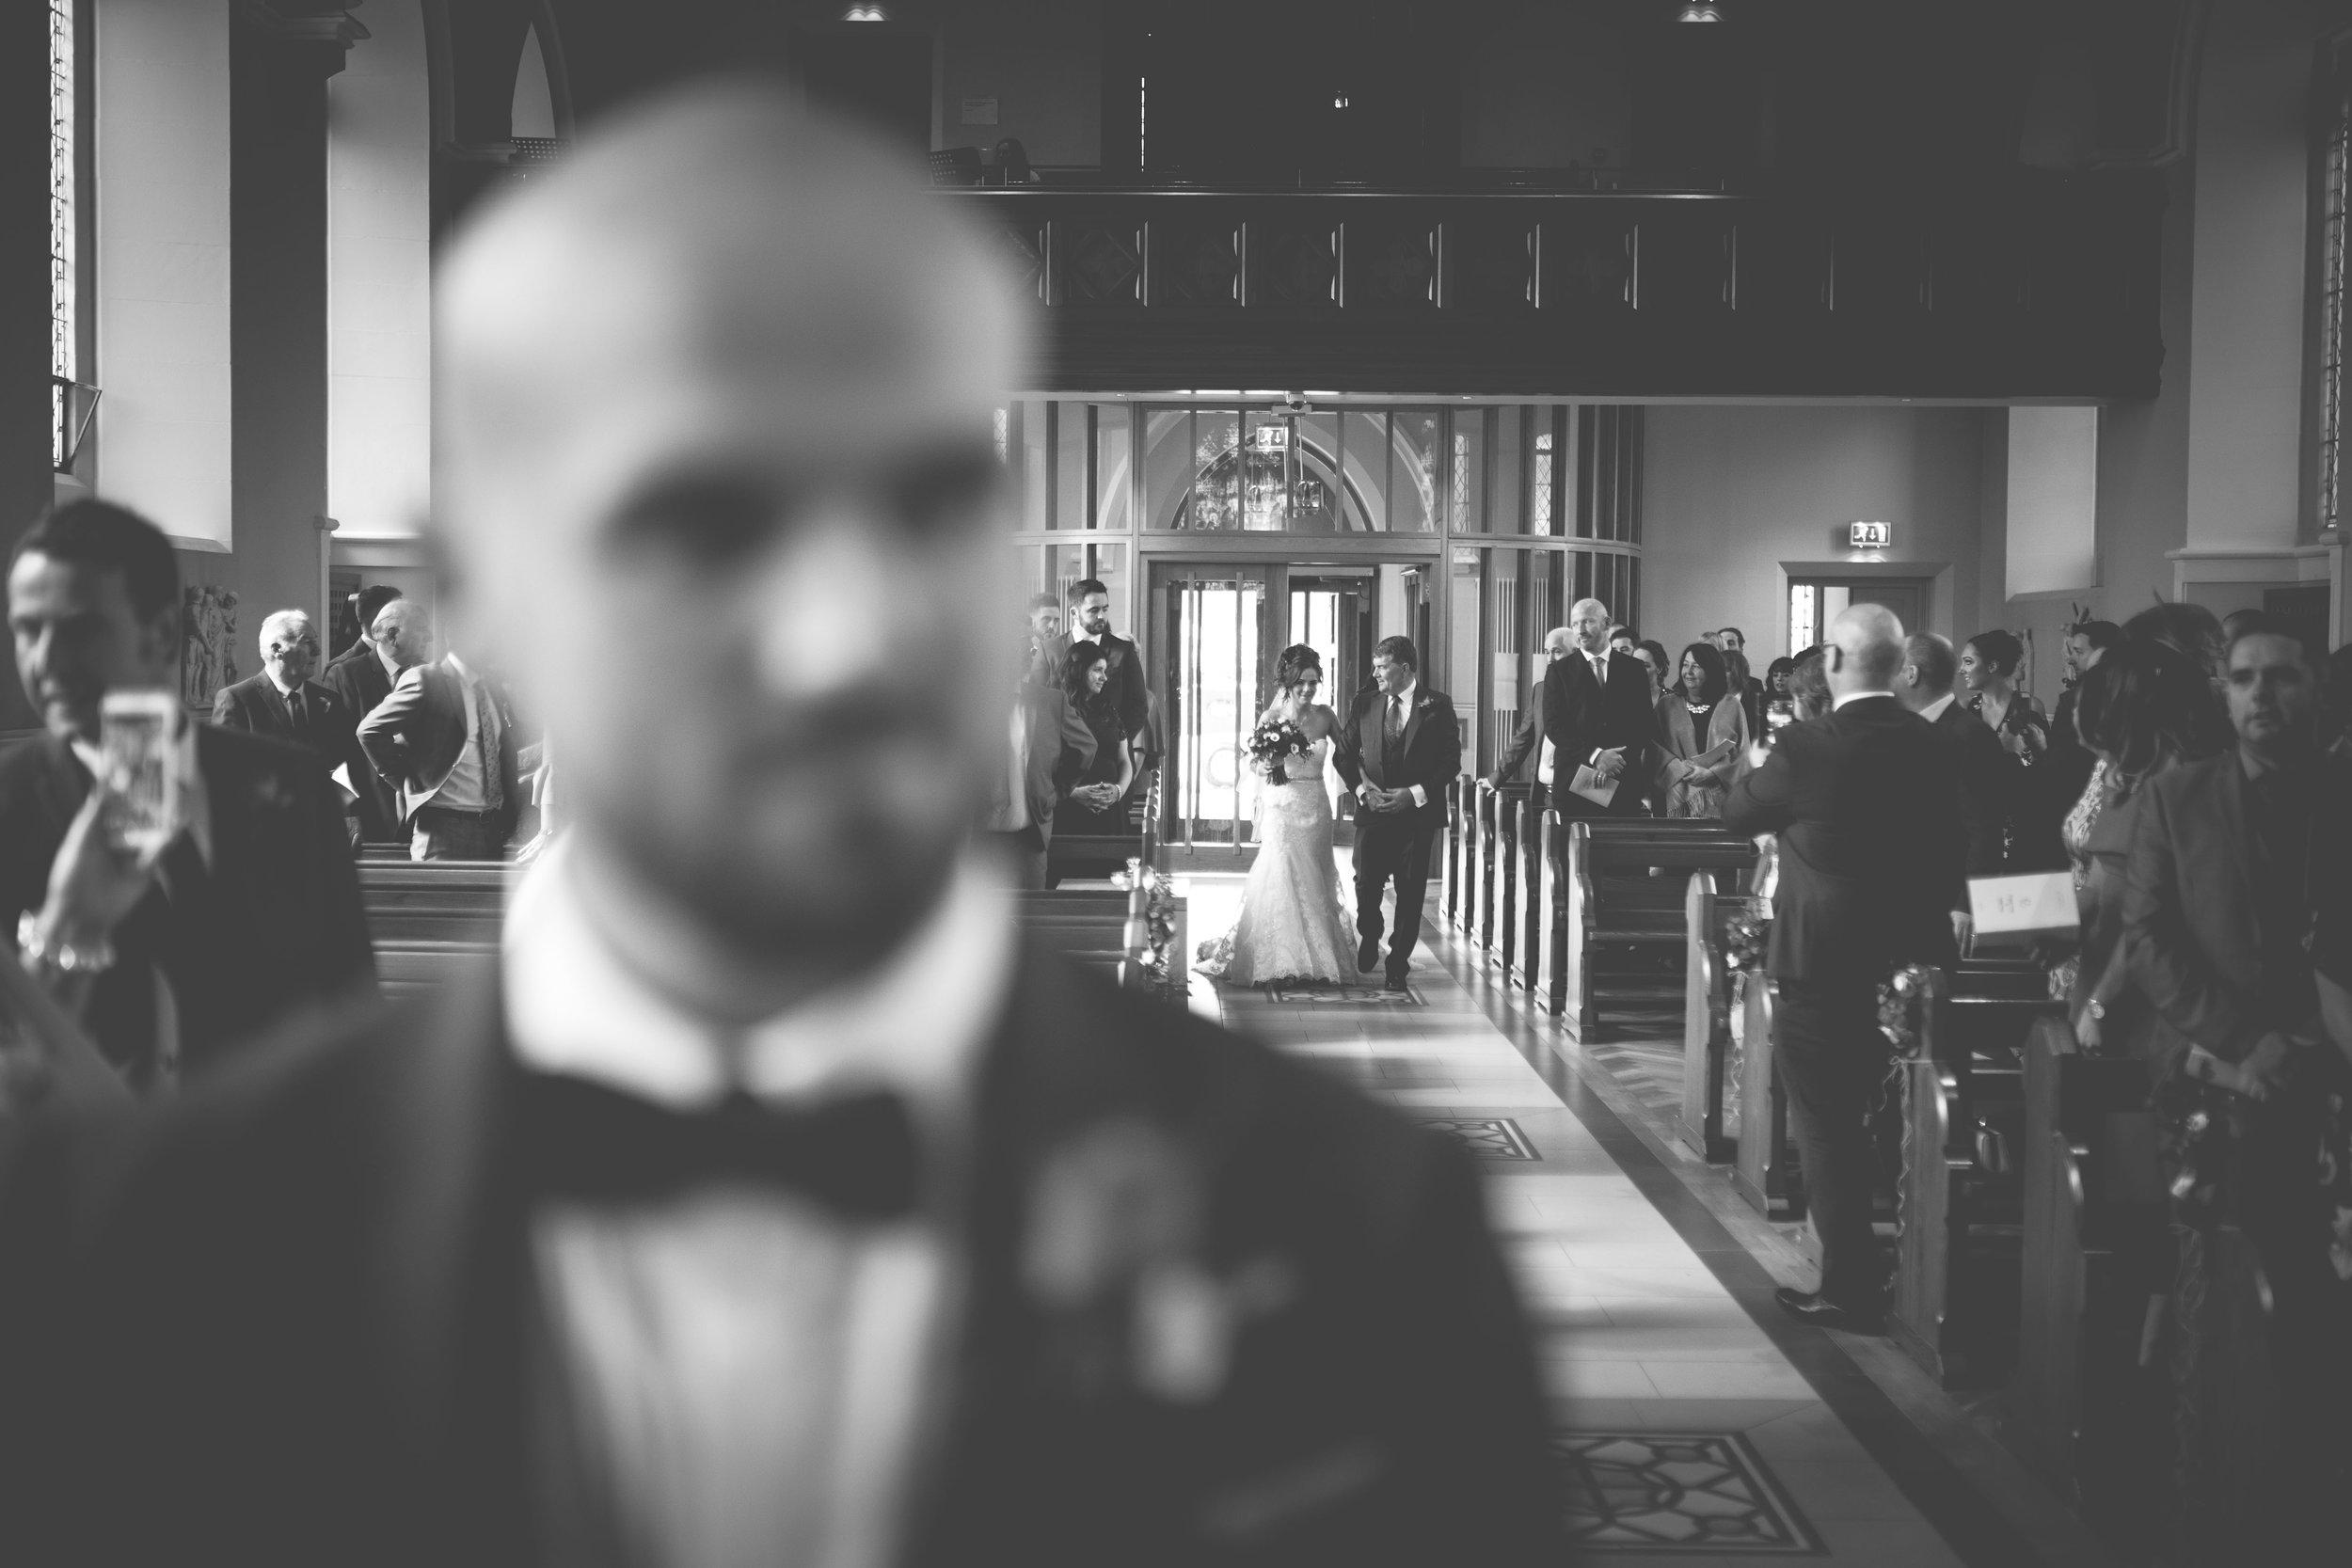 Northern Ireland Wedding Photographer | Brian McEwan Photography | Affordable Wedding Photography Throughout Antrim Down Armagh Tyrone Londonderry Derry Down Fermanagh -38.jpg